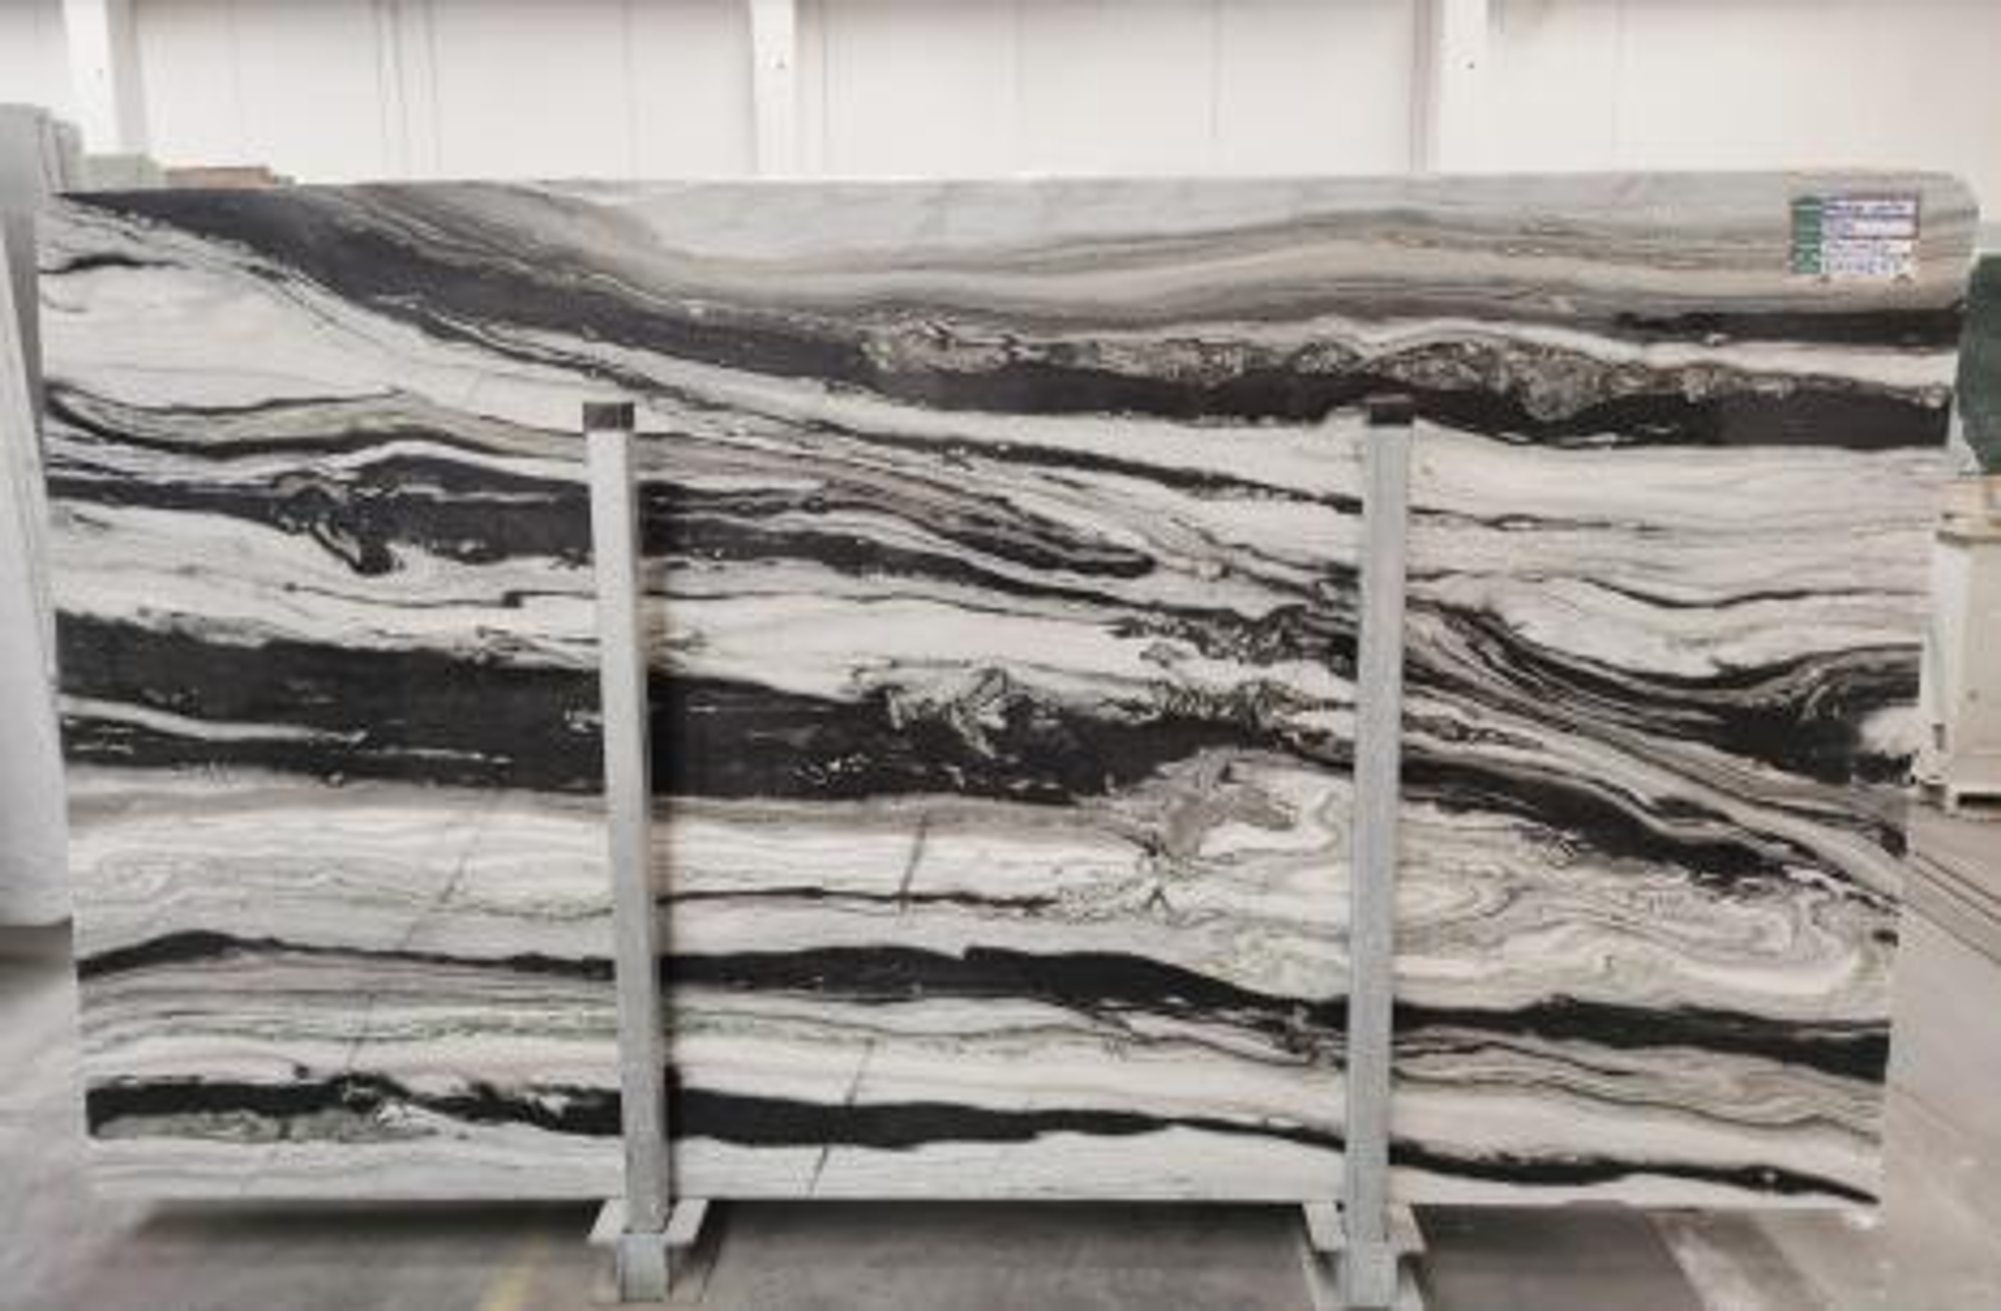 PANDA GREY polierte Unmaßplatten D-7130 aus Natur Marmor , SL3CM: Lieferung Veneto, Italien